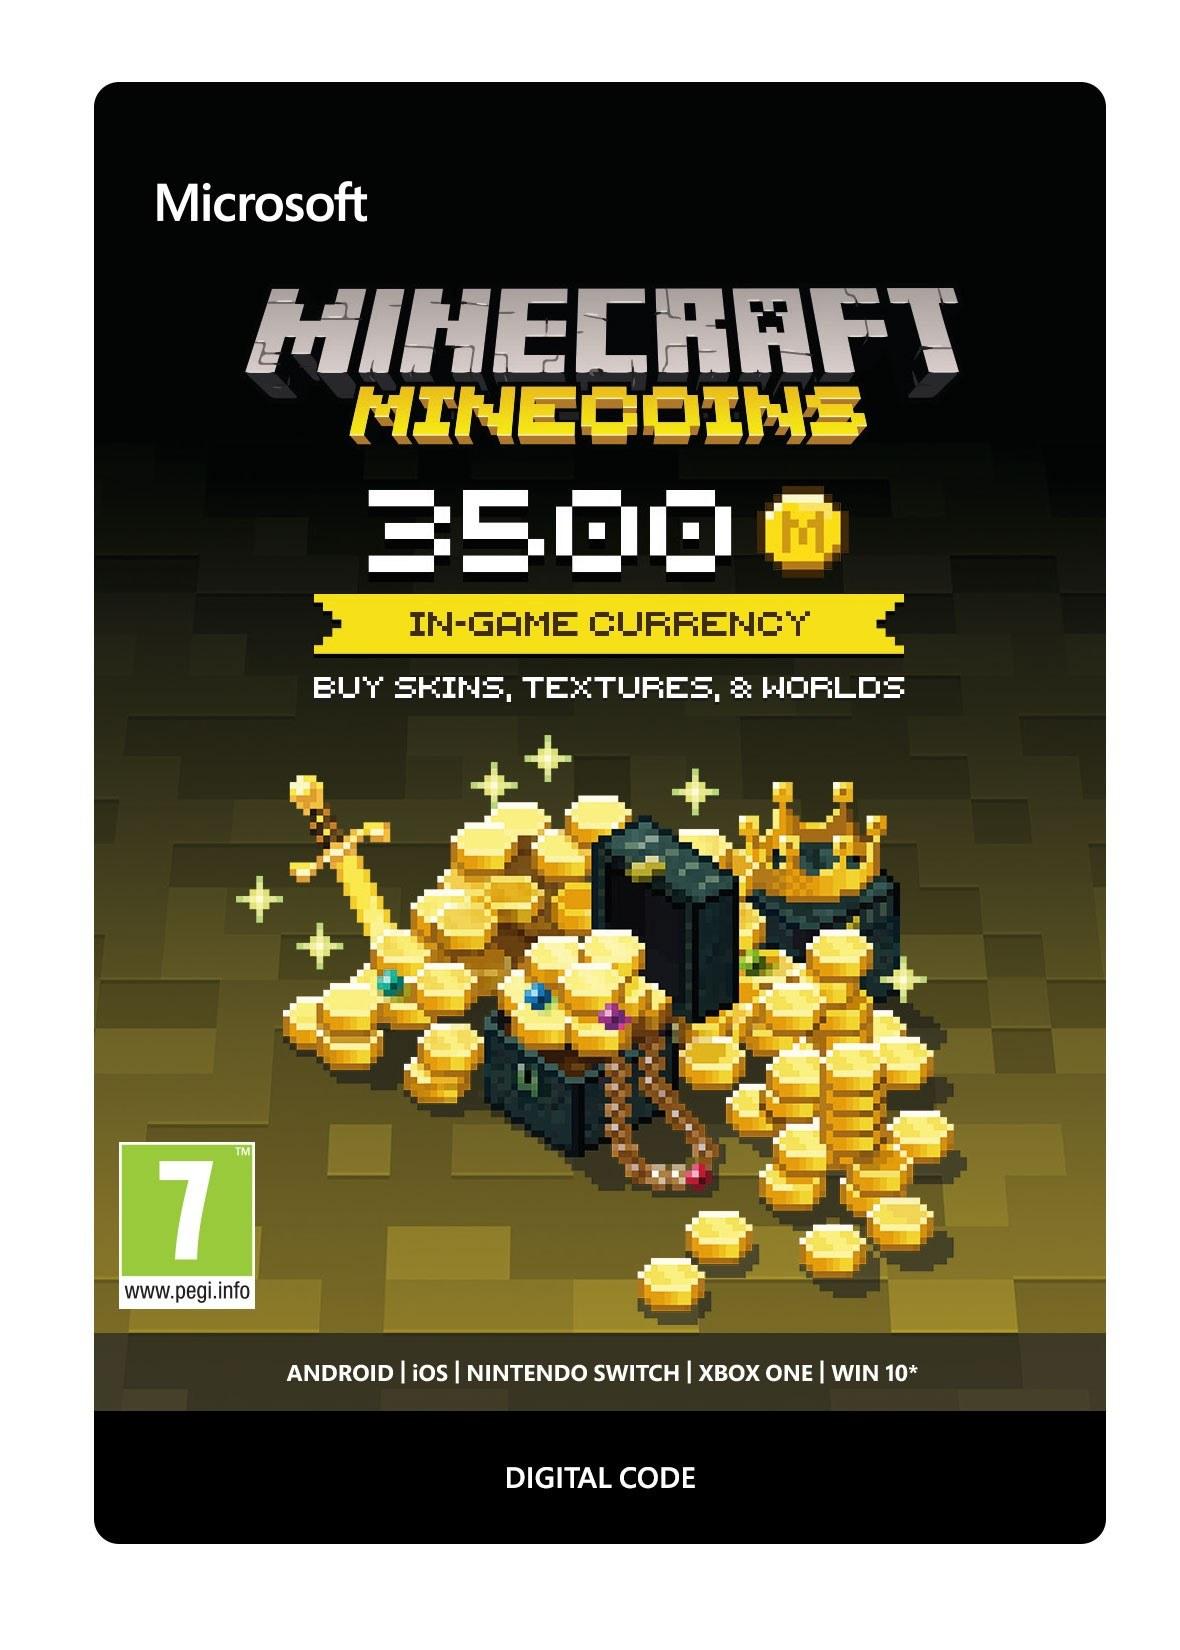 Comprar Código 3500 Minecraft Minecoins